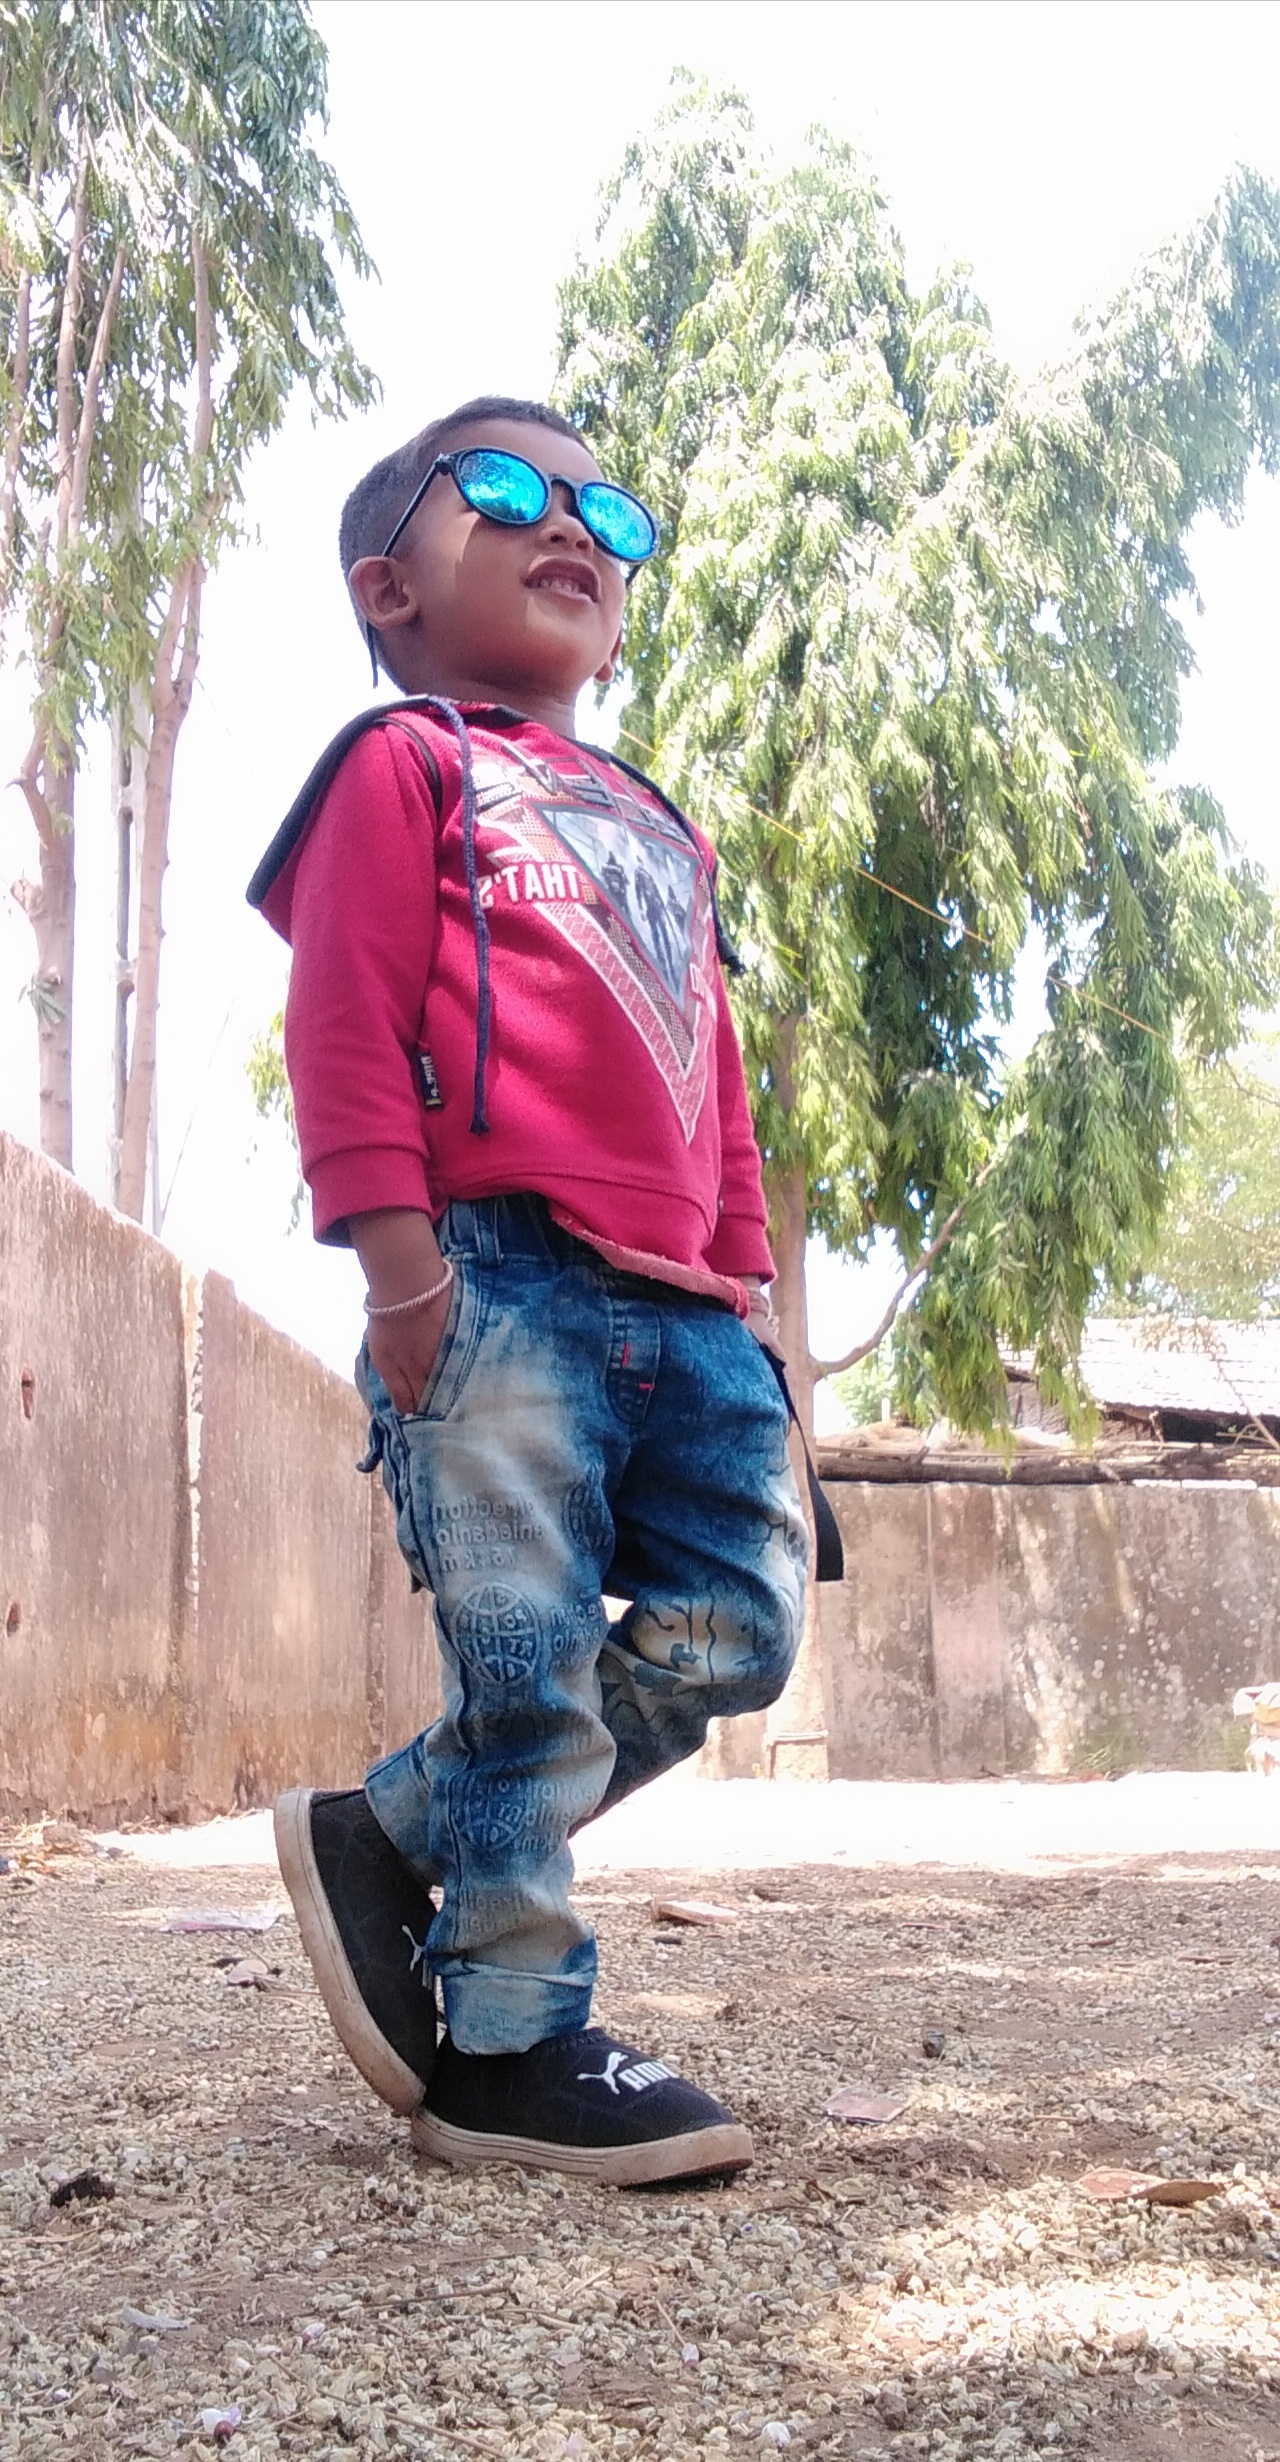 Kid posing on street